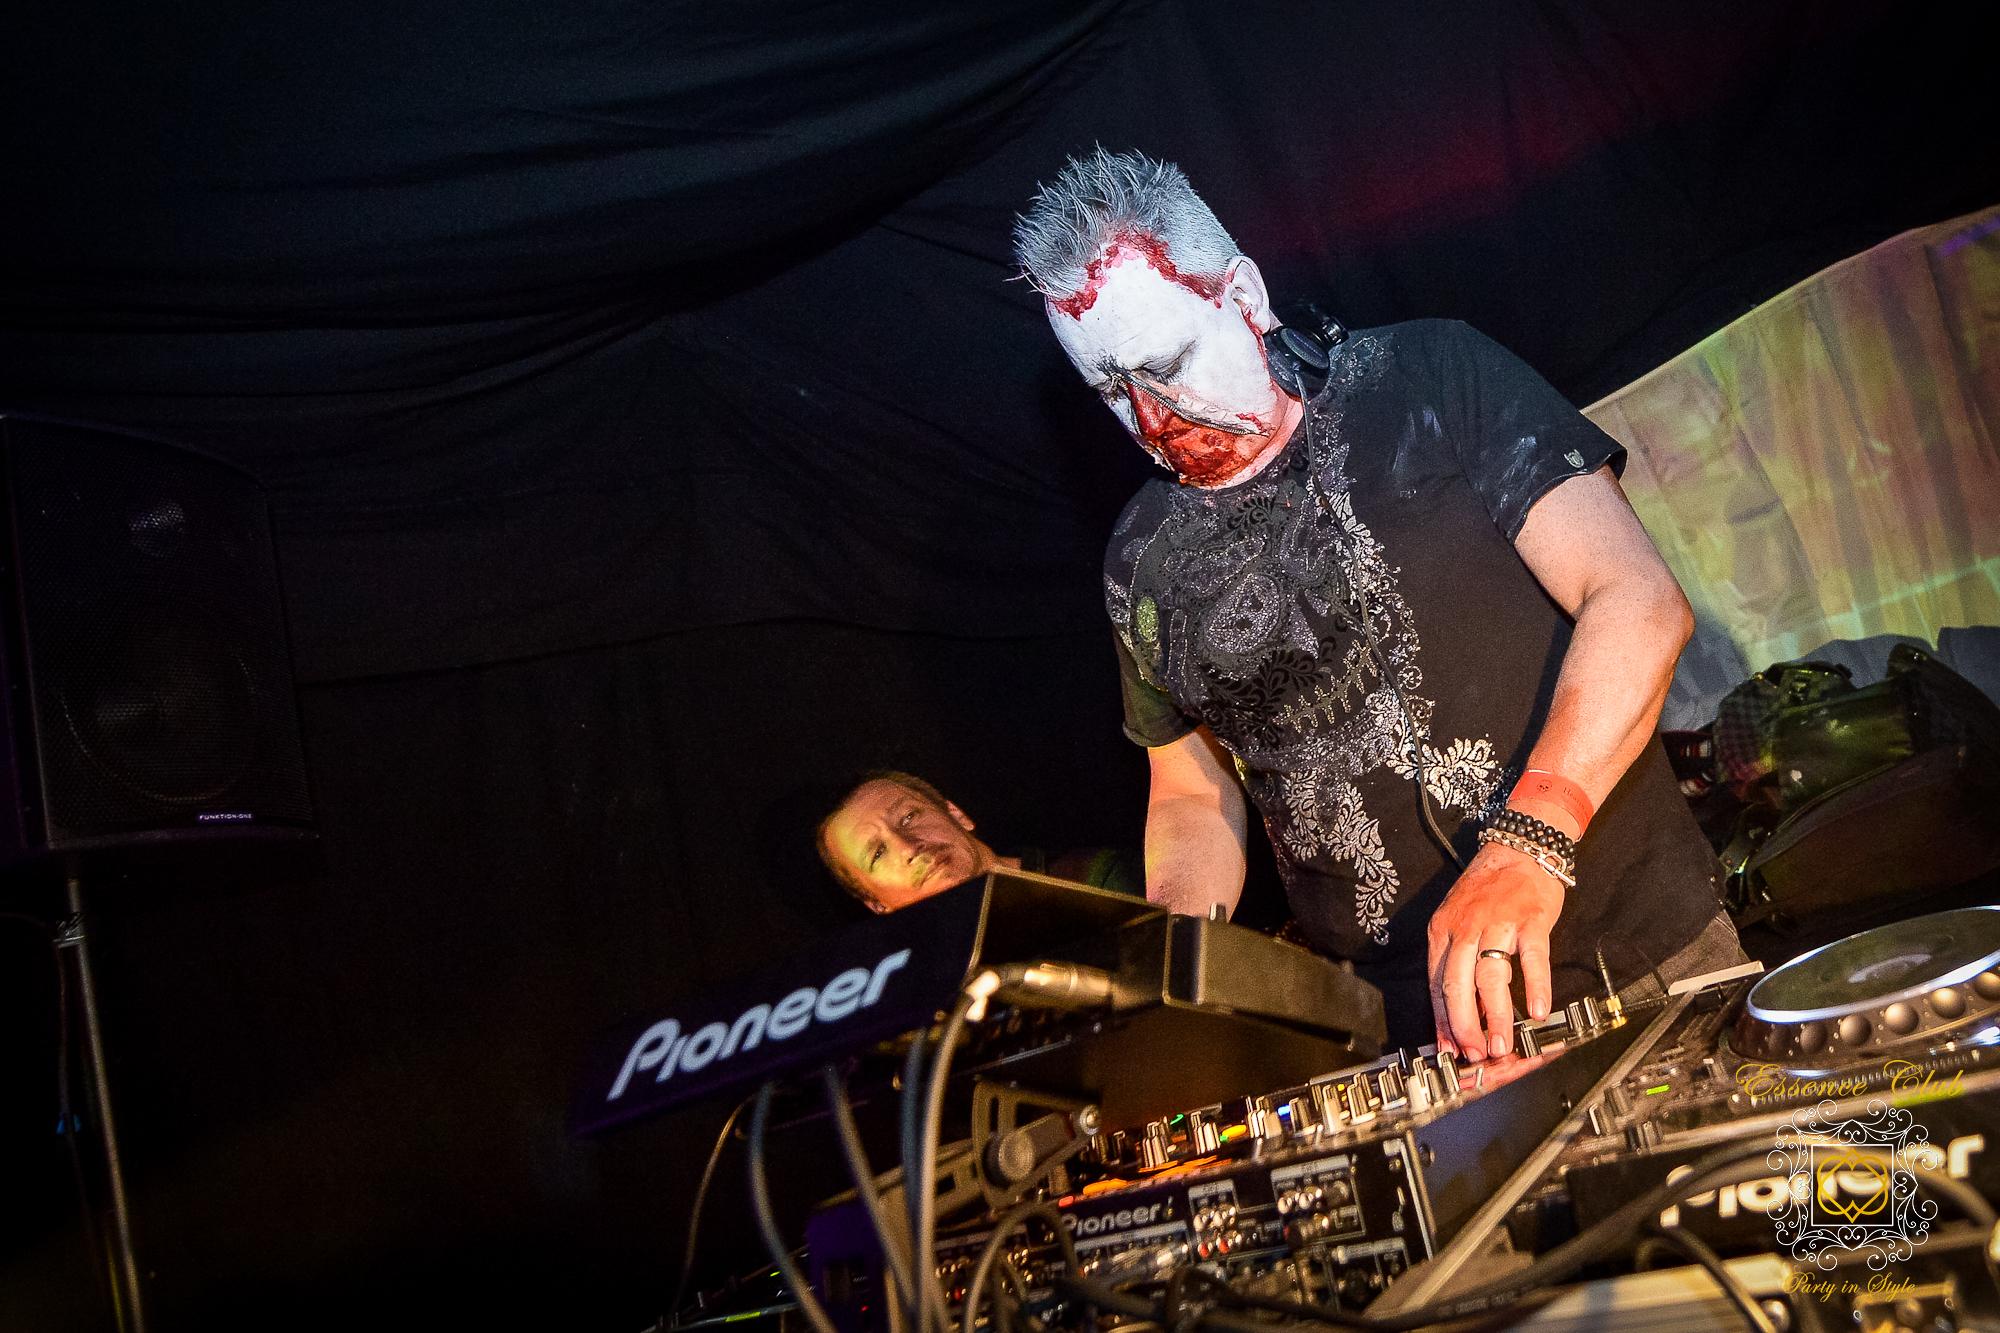 Mark Doyle Dj at Essence club heaven and hell